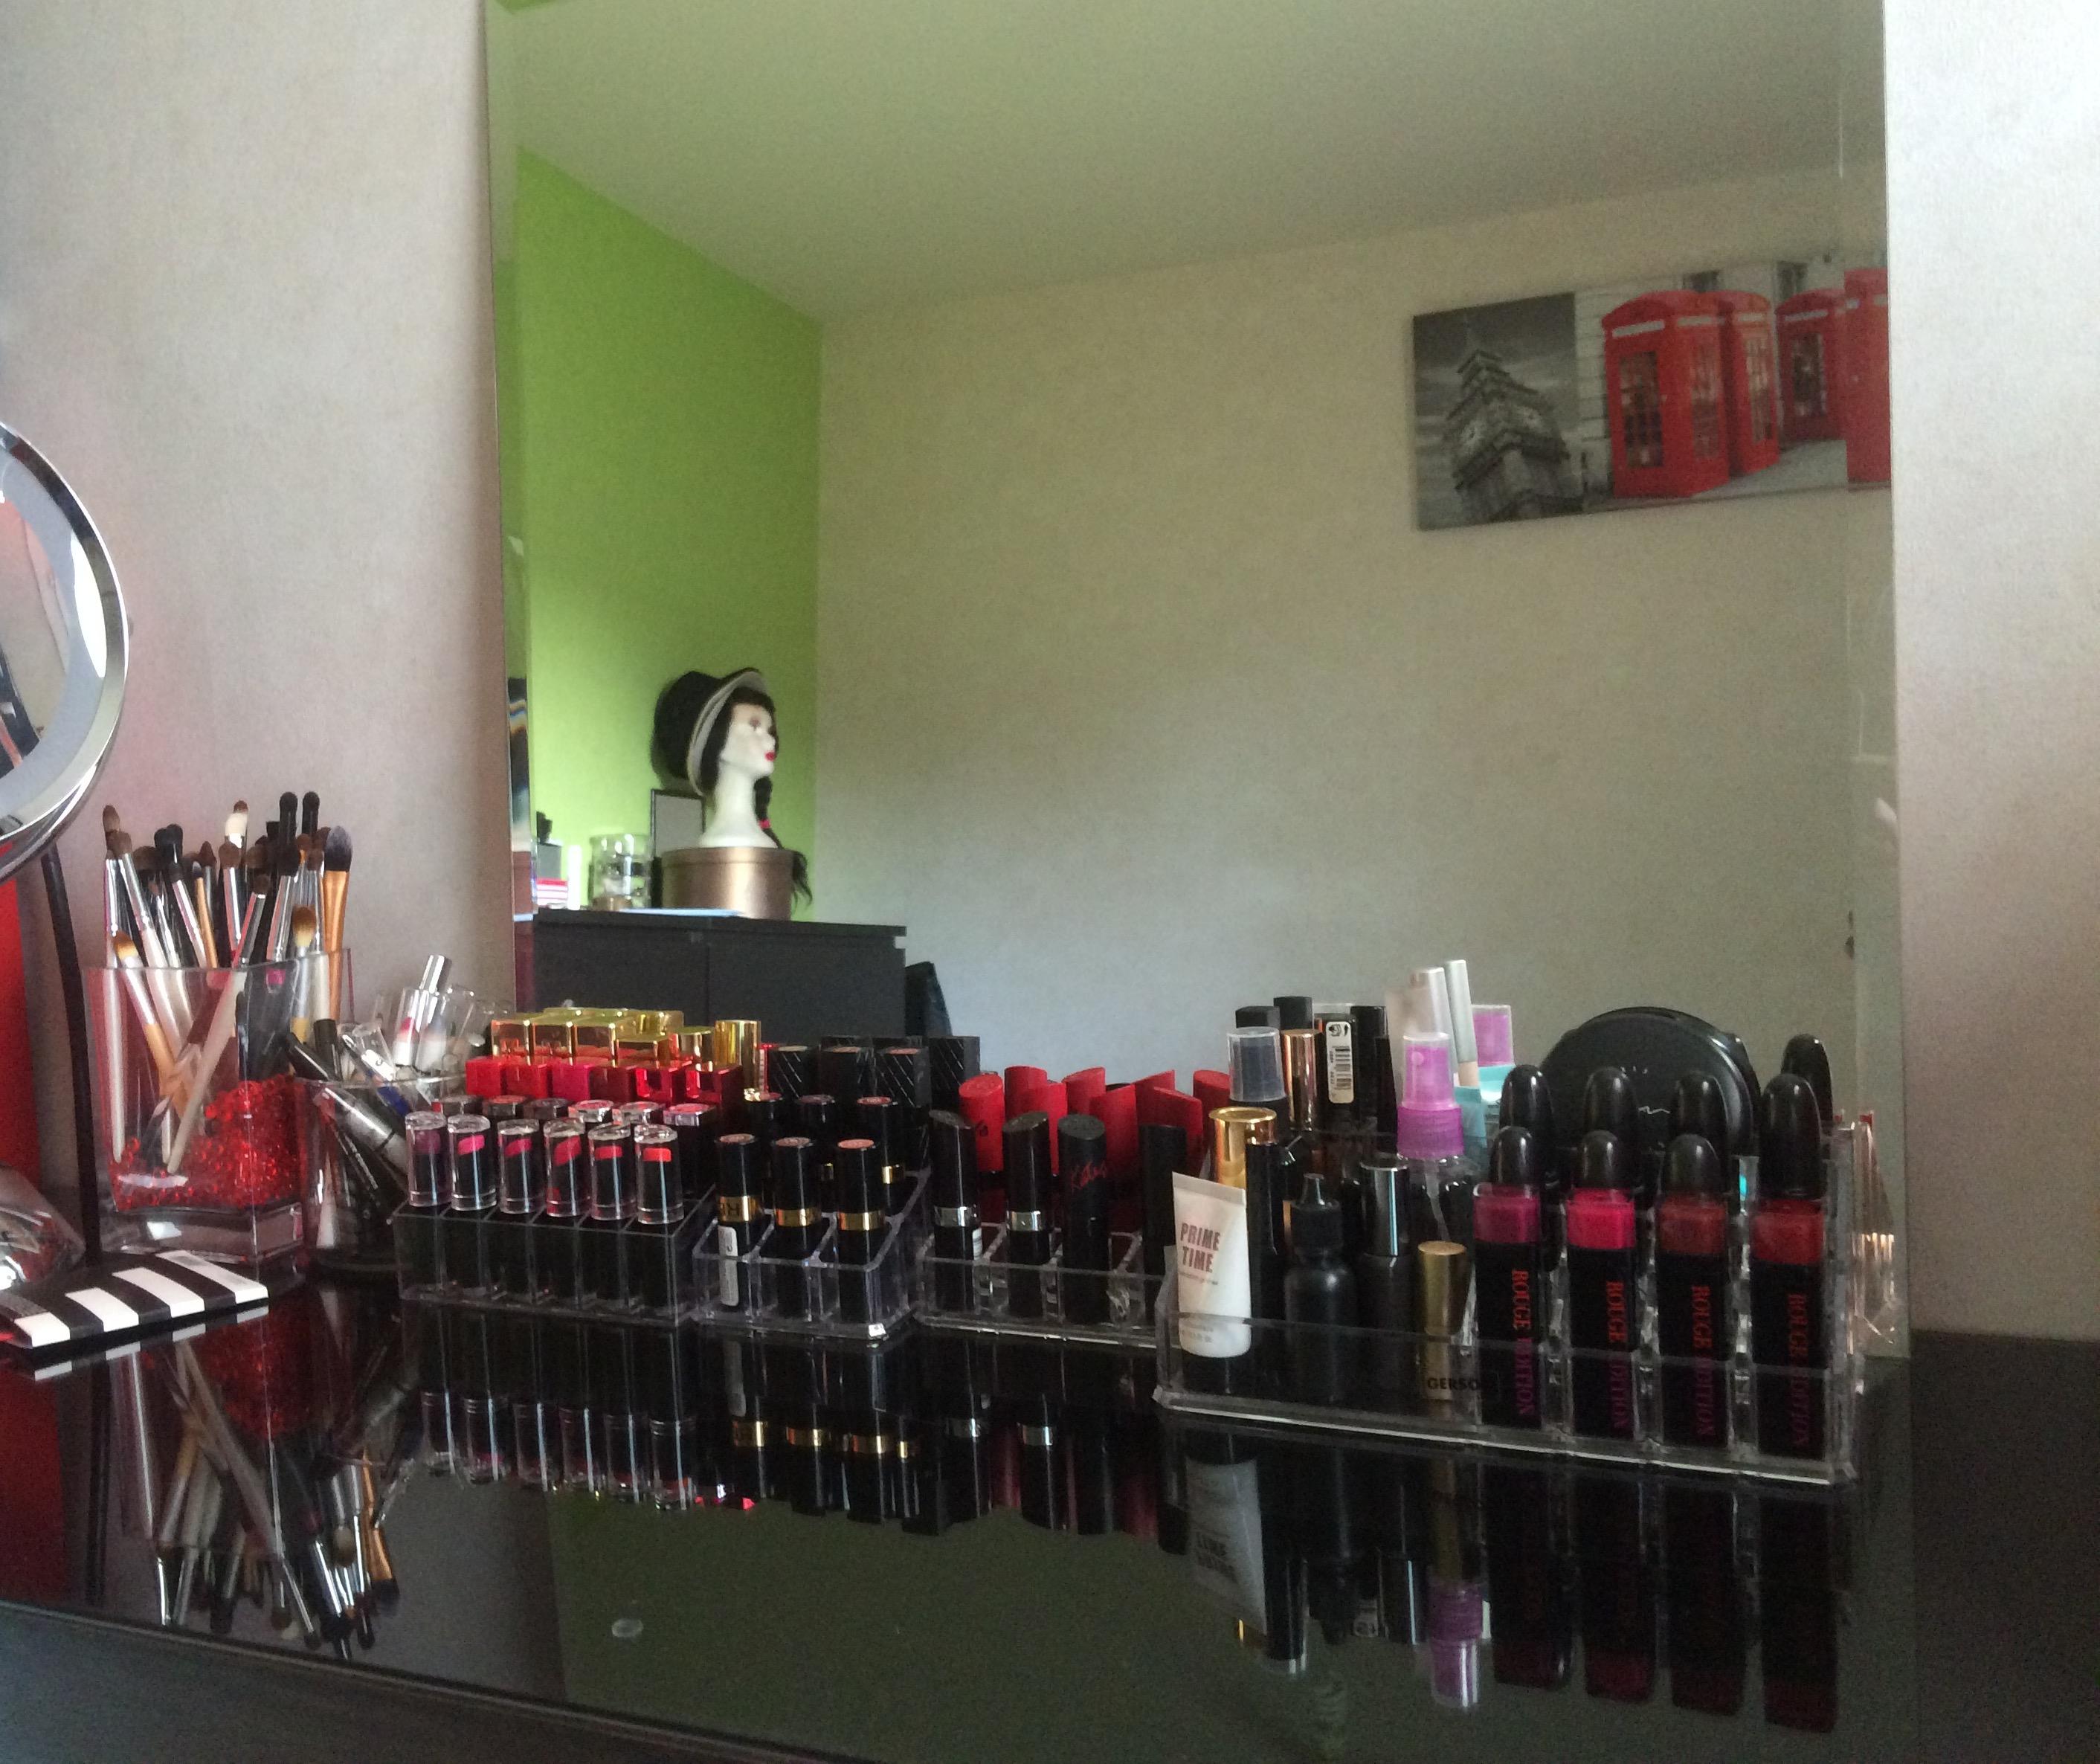 nunaavane-makeup-storage-organization-ctbb-bblogger